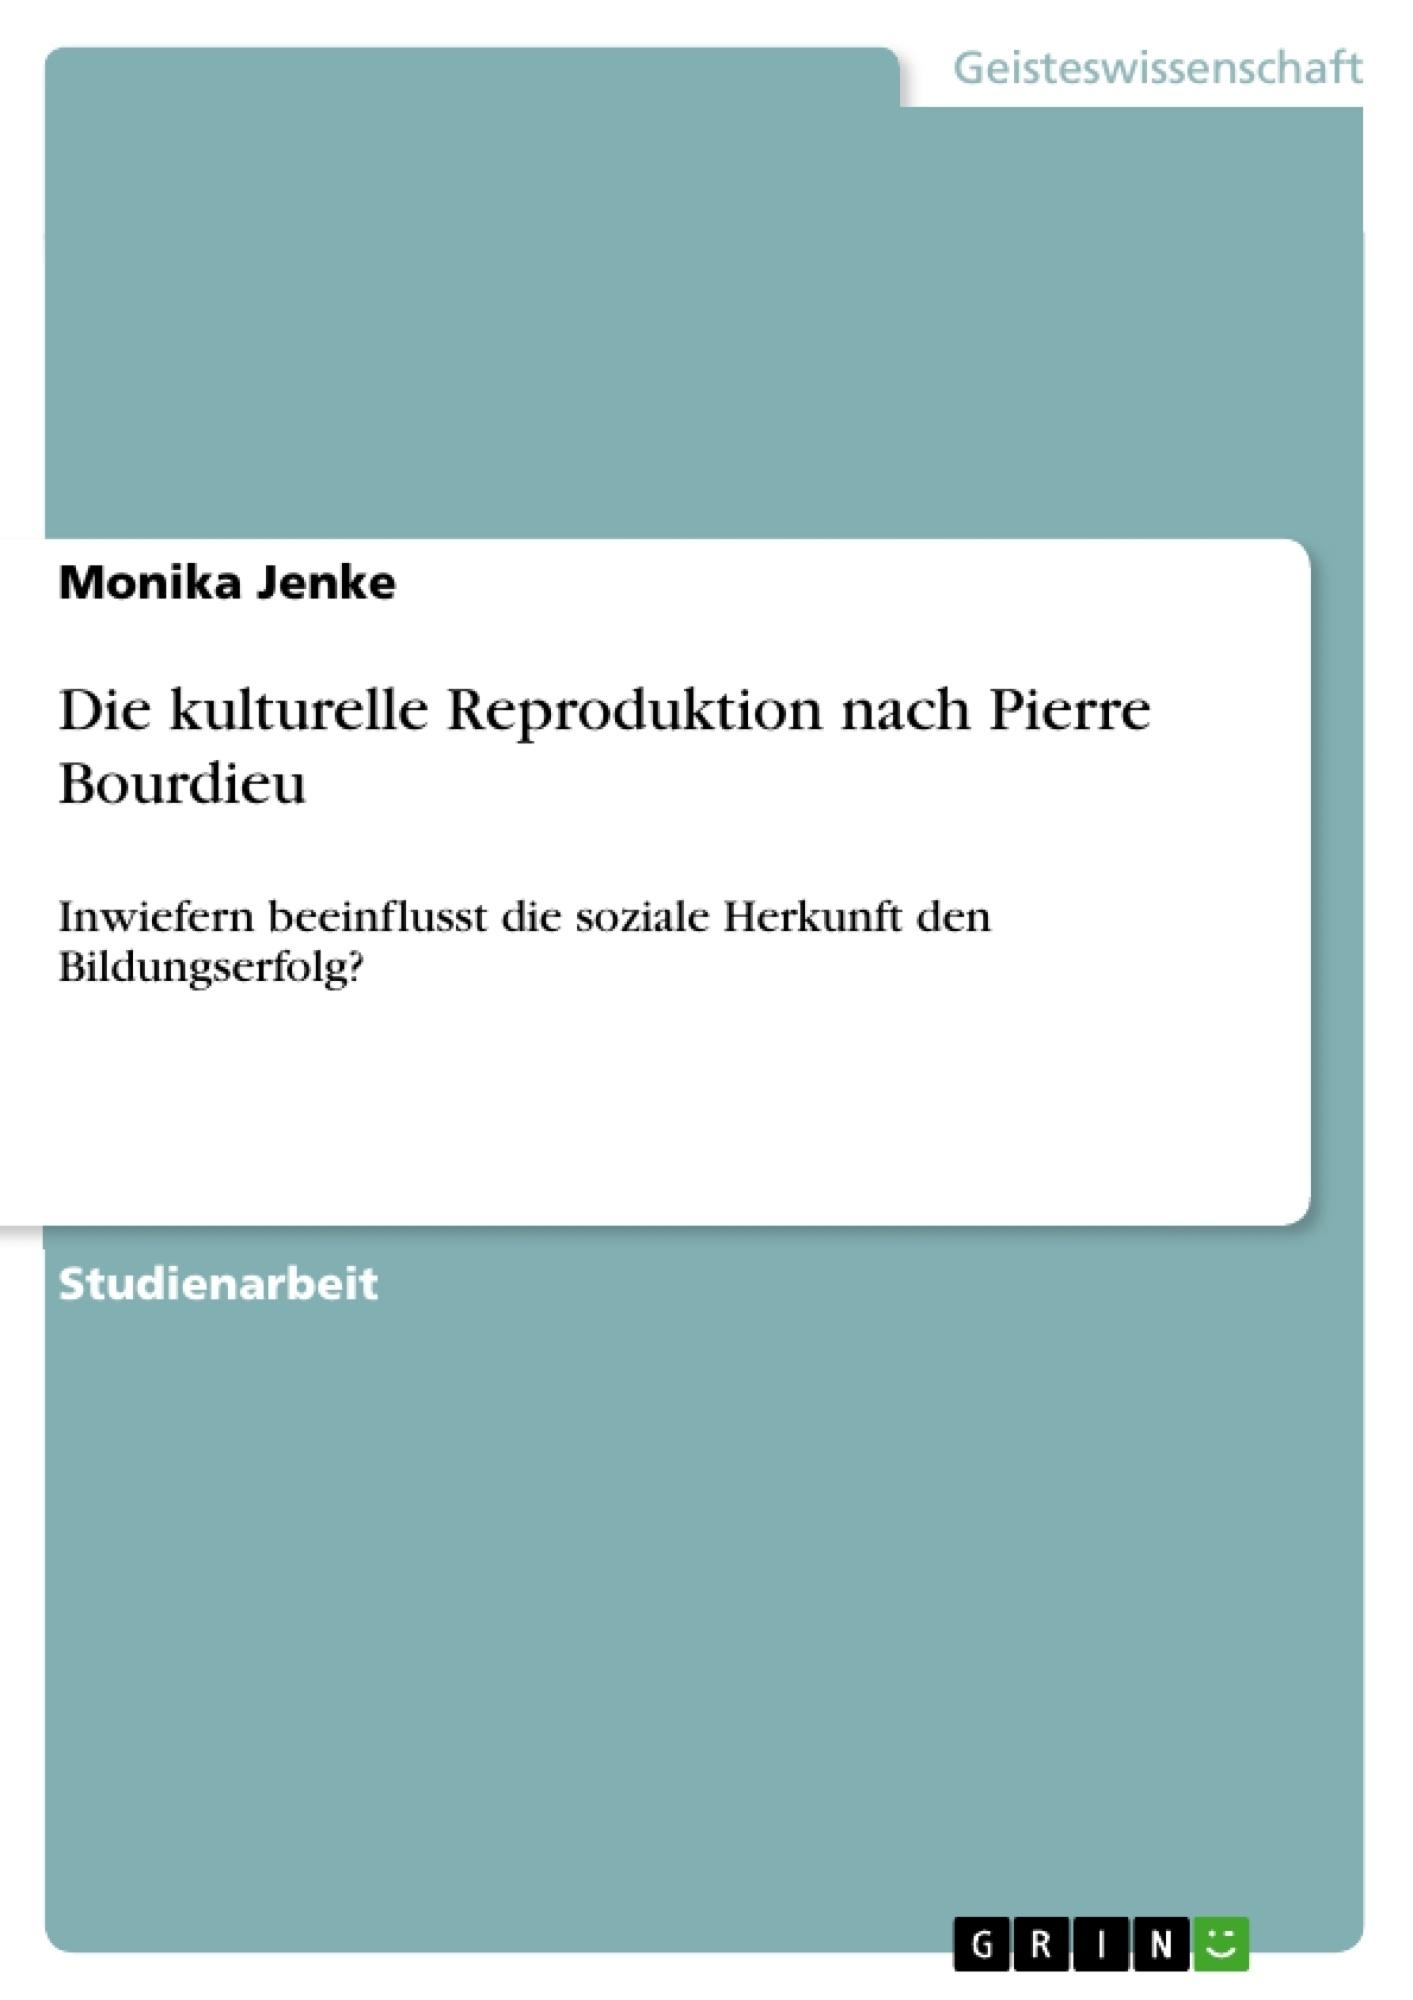 Titel: Die kulturelle Reproduktion nach Pierre Bourdieu